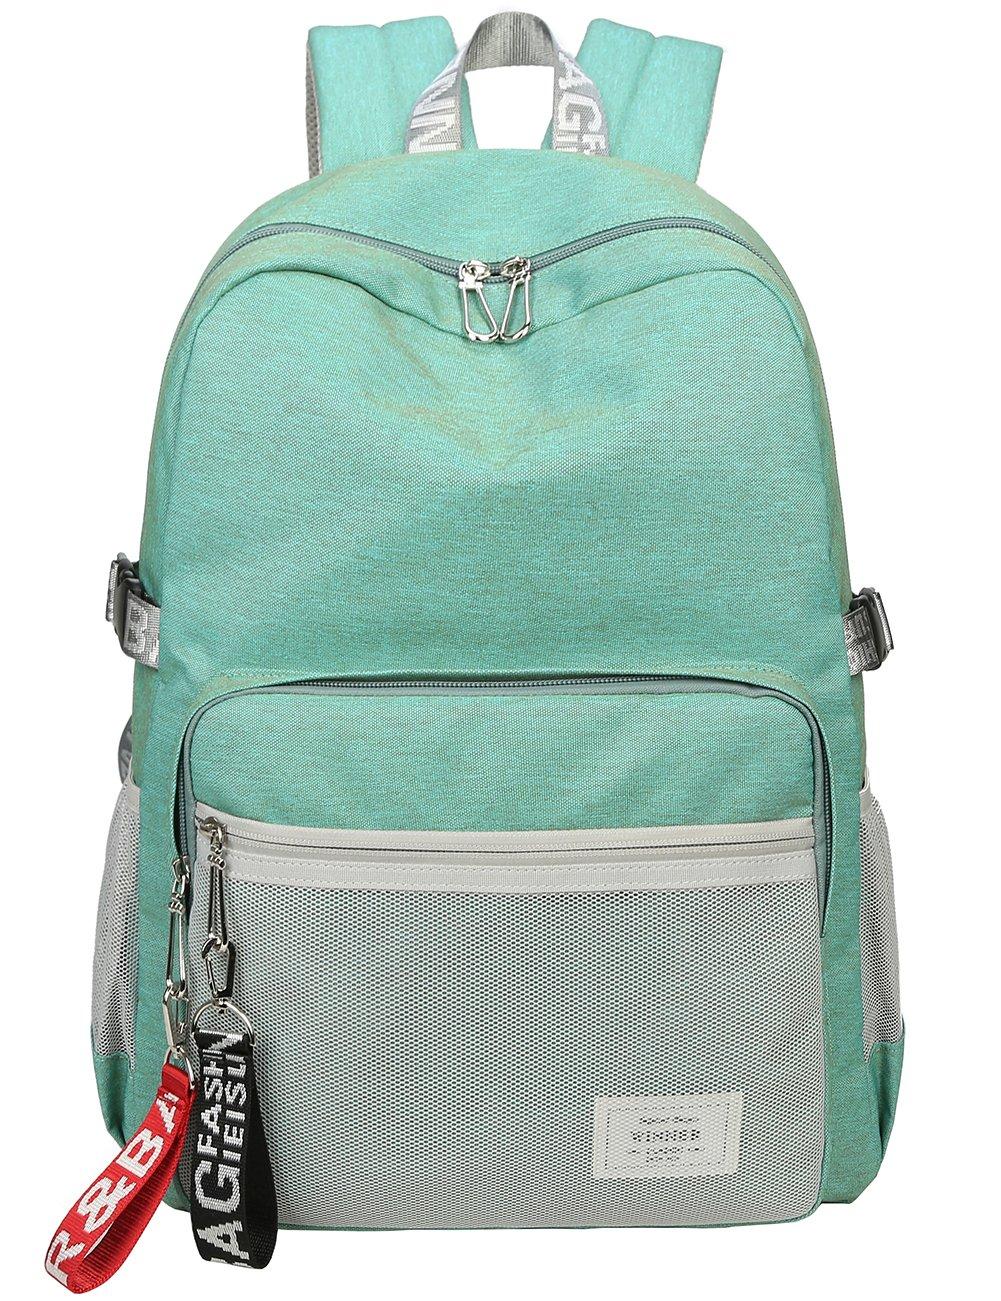 Classic Backpack Haversack Travel School Bag Student Simple Daypack Bookbag by Mygreen(Light Green) by mygreen